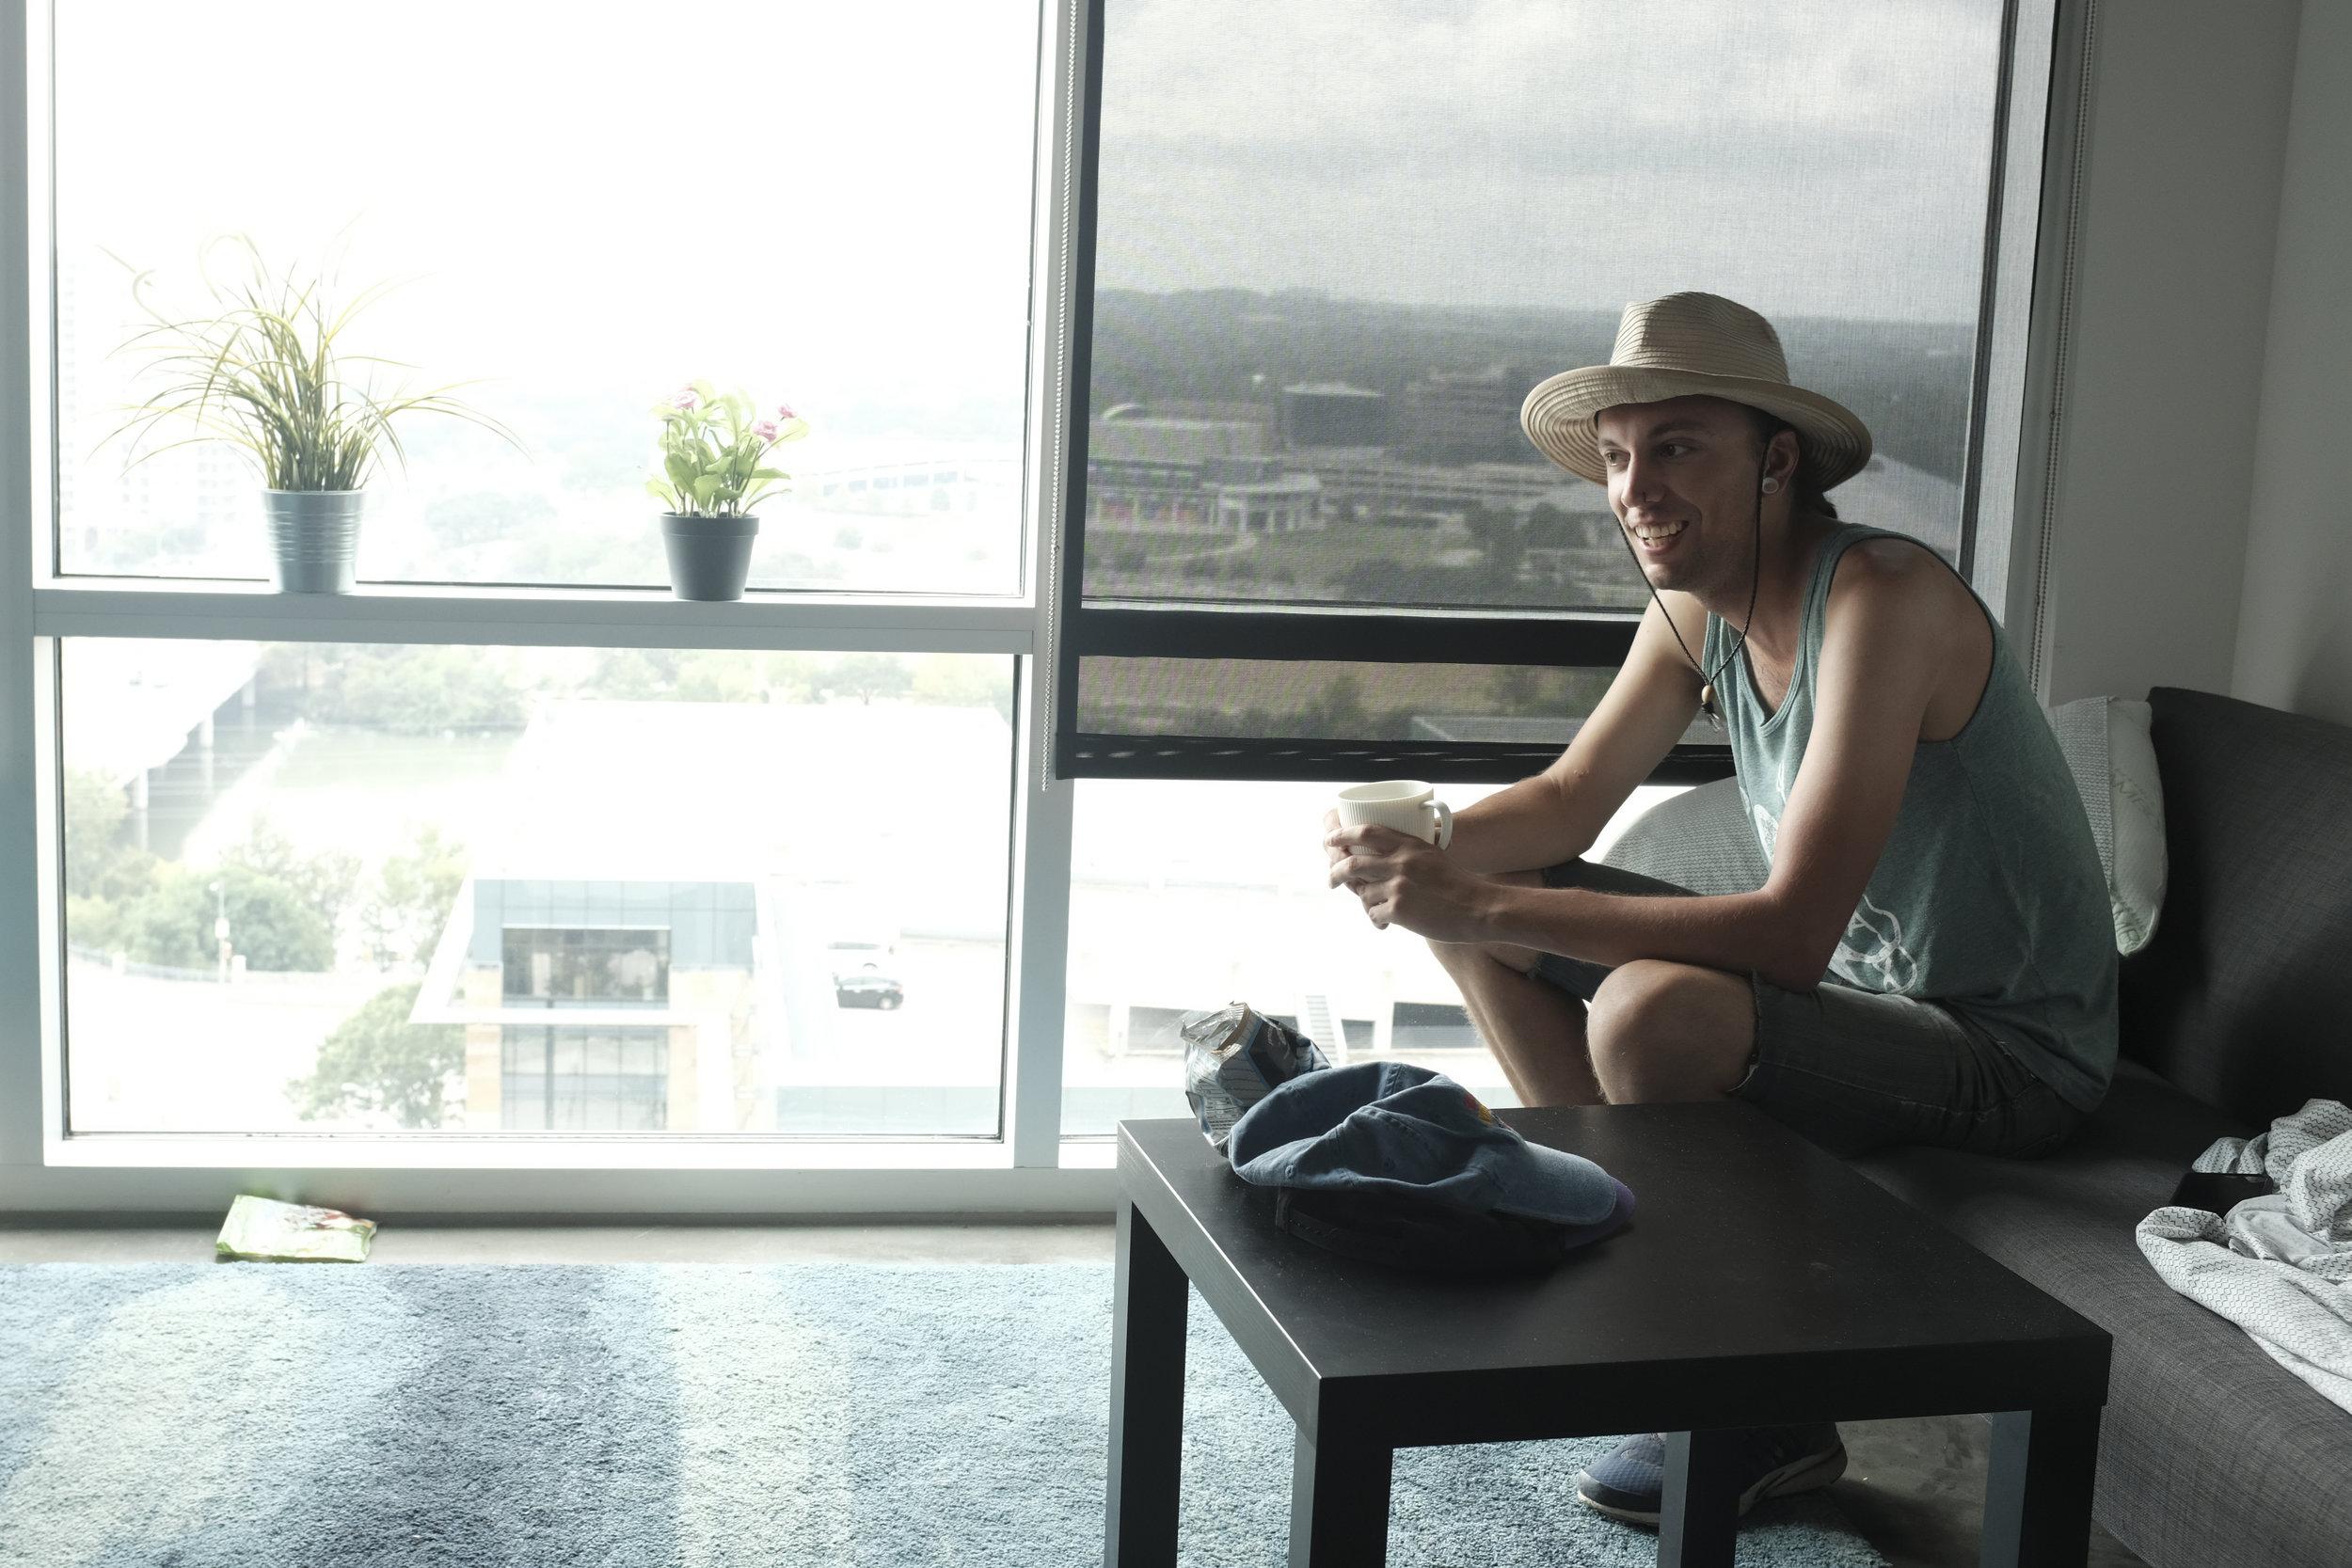 Joe enjoying a cup of Joe.